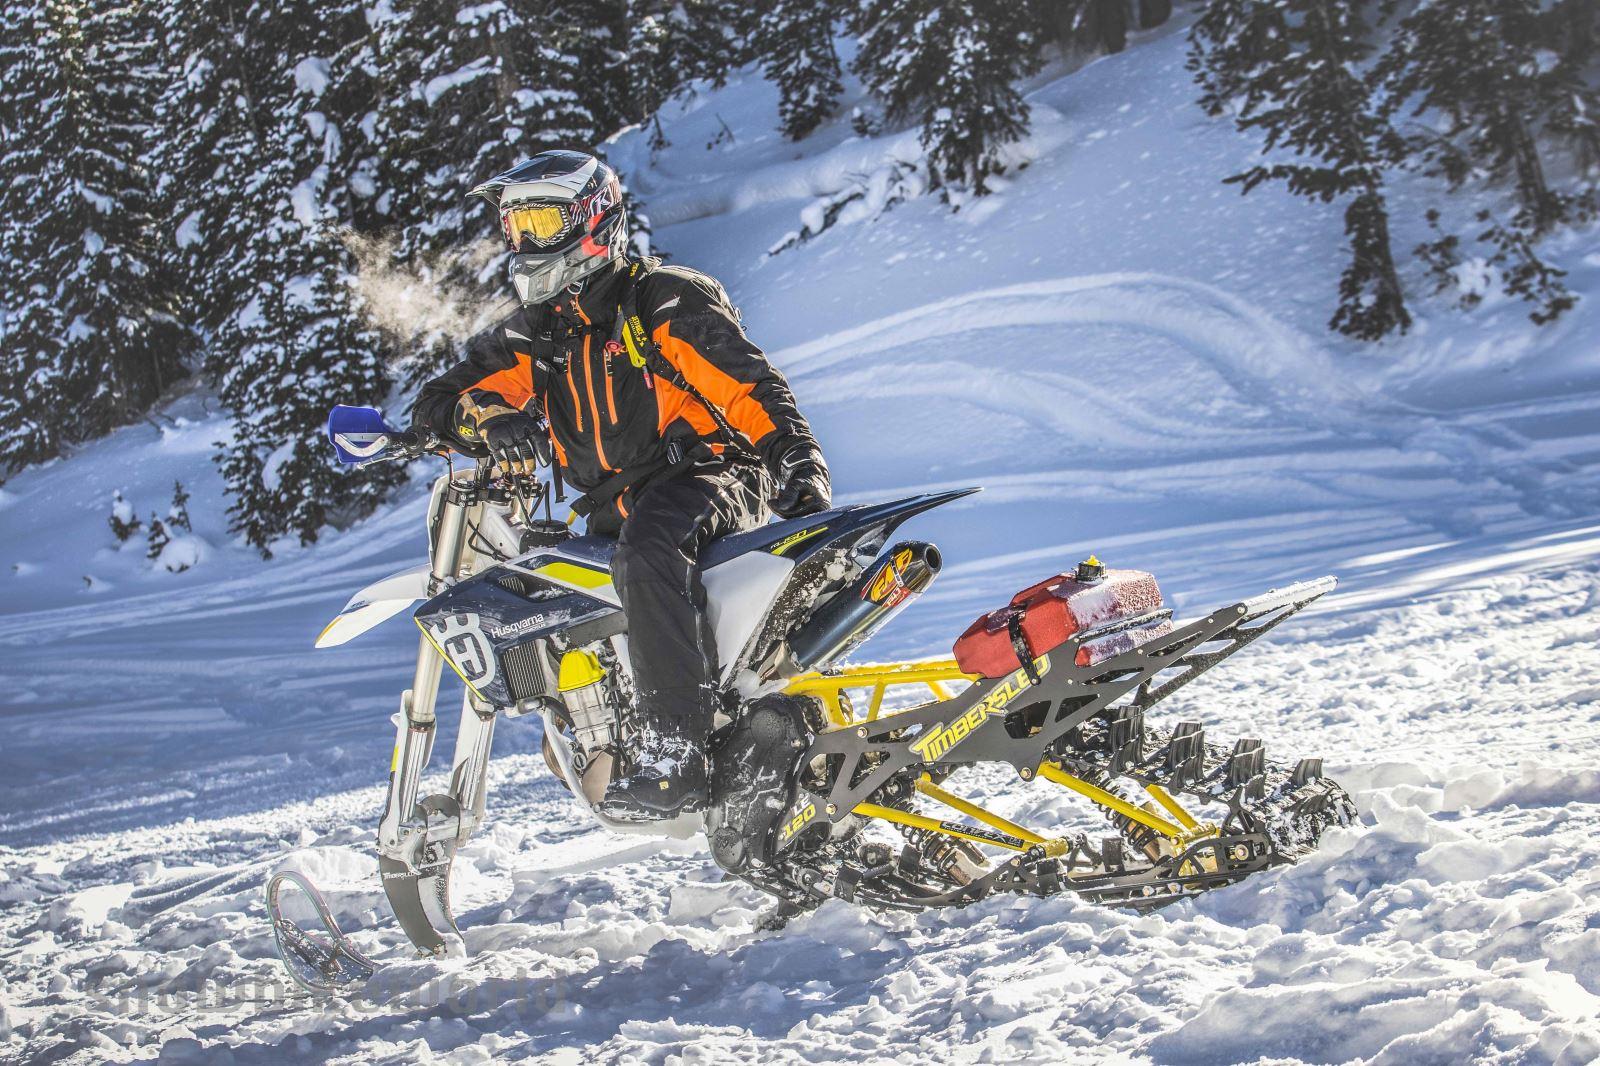 First Ride On Dirt Snowest S 2015 Yamaha Yz450f Snow Bike Build